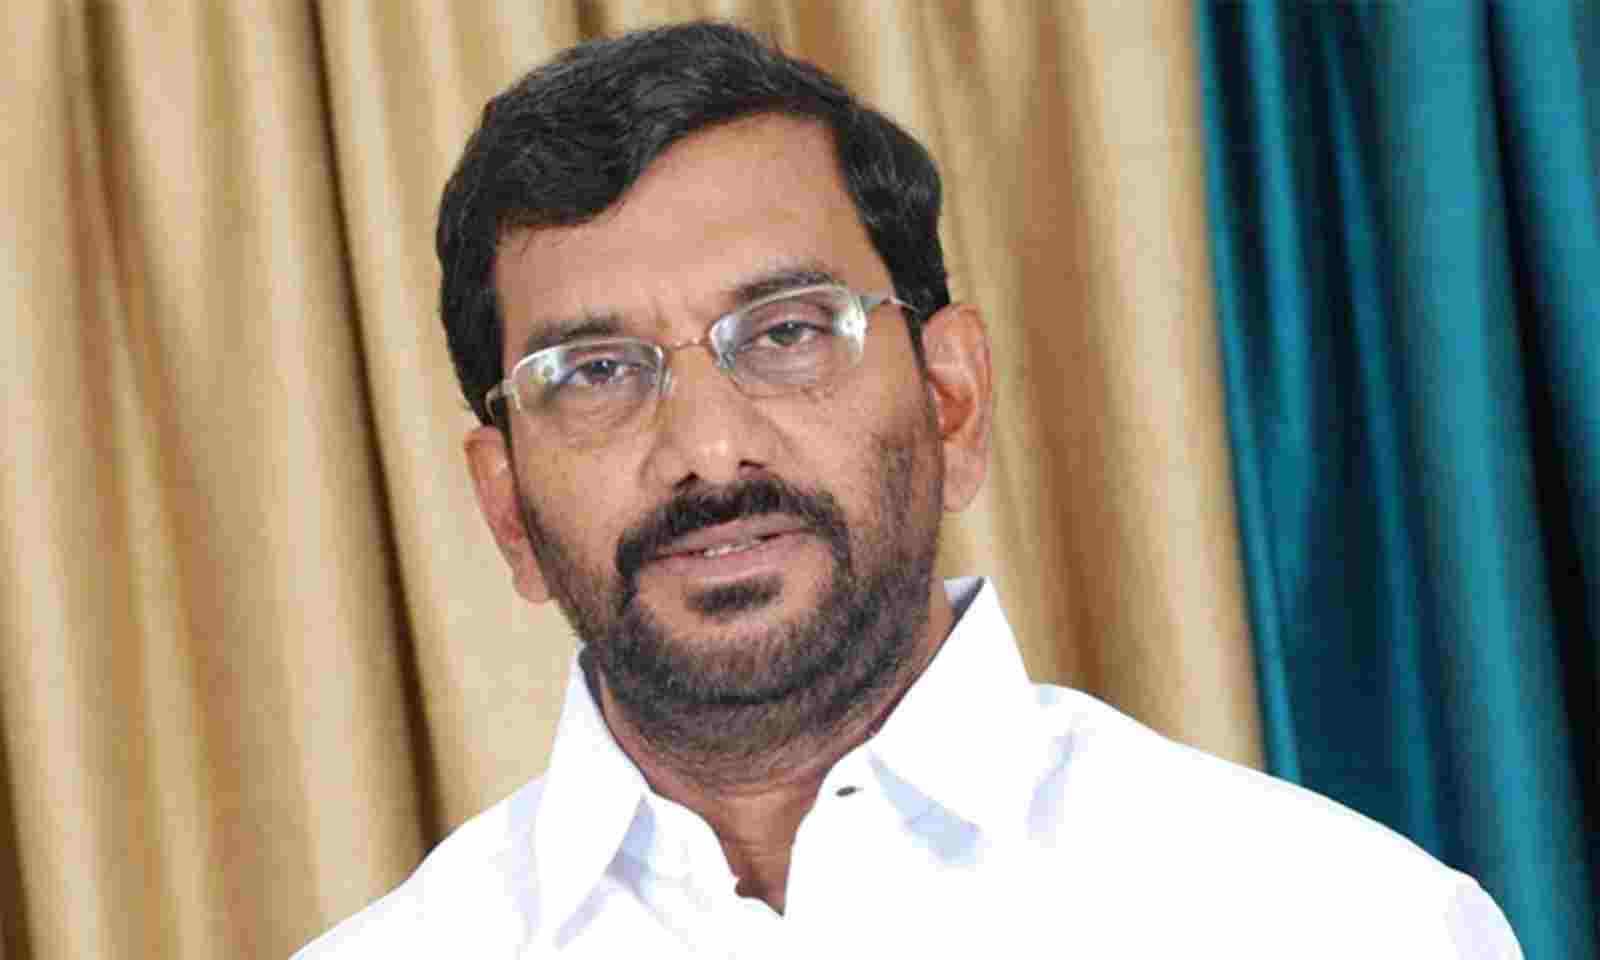 TDP leader Somireddy Chandramohan Reddy hails Supreme Court's remark on SC/ST quota